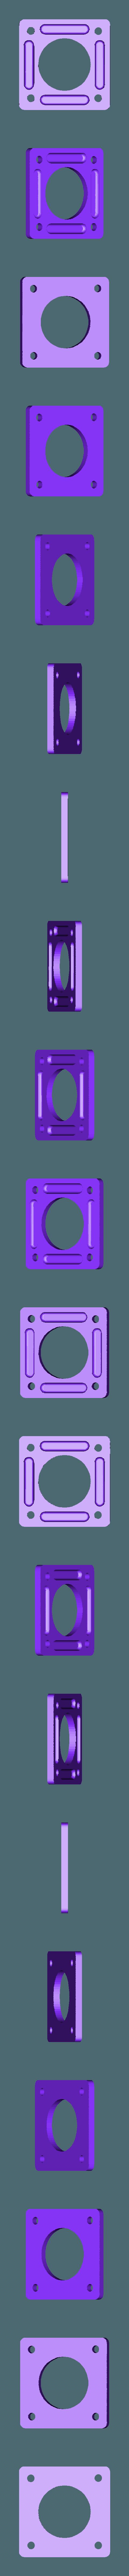 Nema_17_Stepper_Damper_v1.stl Télécharger fichier STL gratuit Ender & CR-10 X Axis Cover et Nema 17 Stepper Damper Spacer Nema 17 • Plan pour impression 3D, FedorSosnin